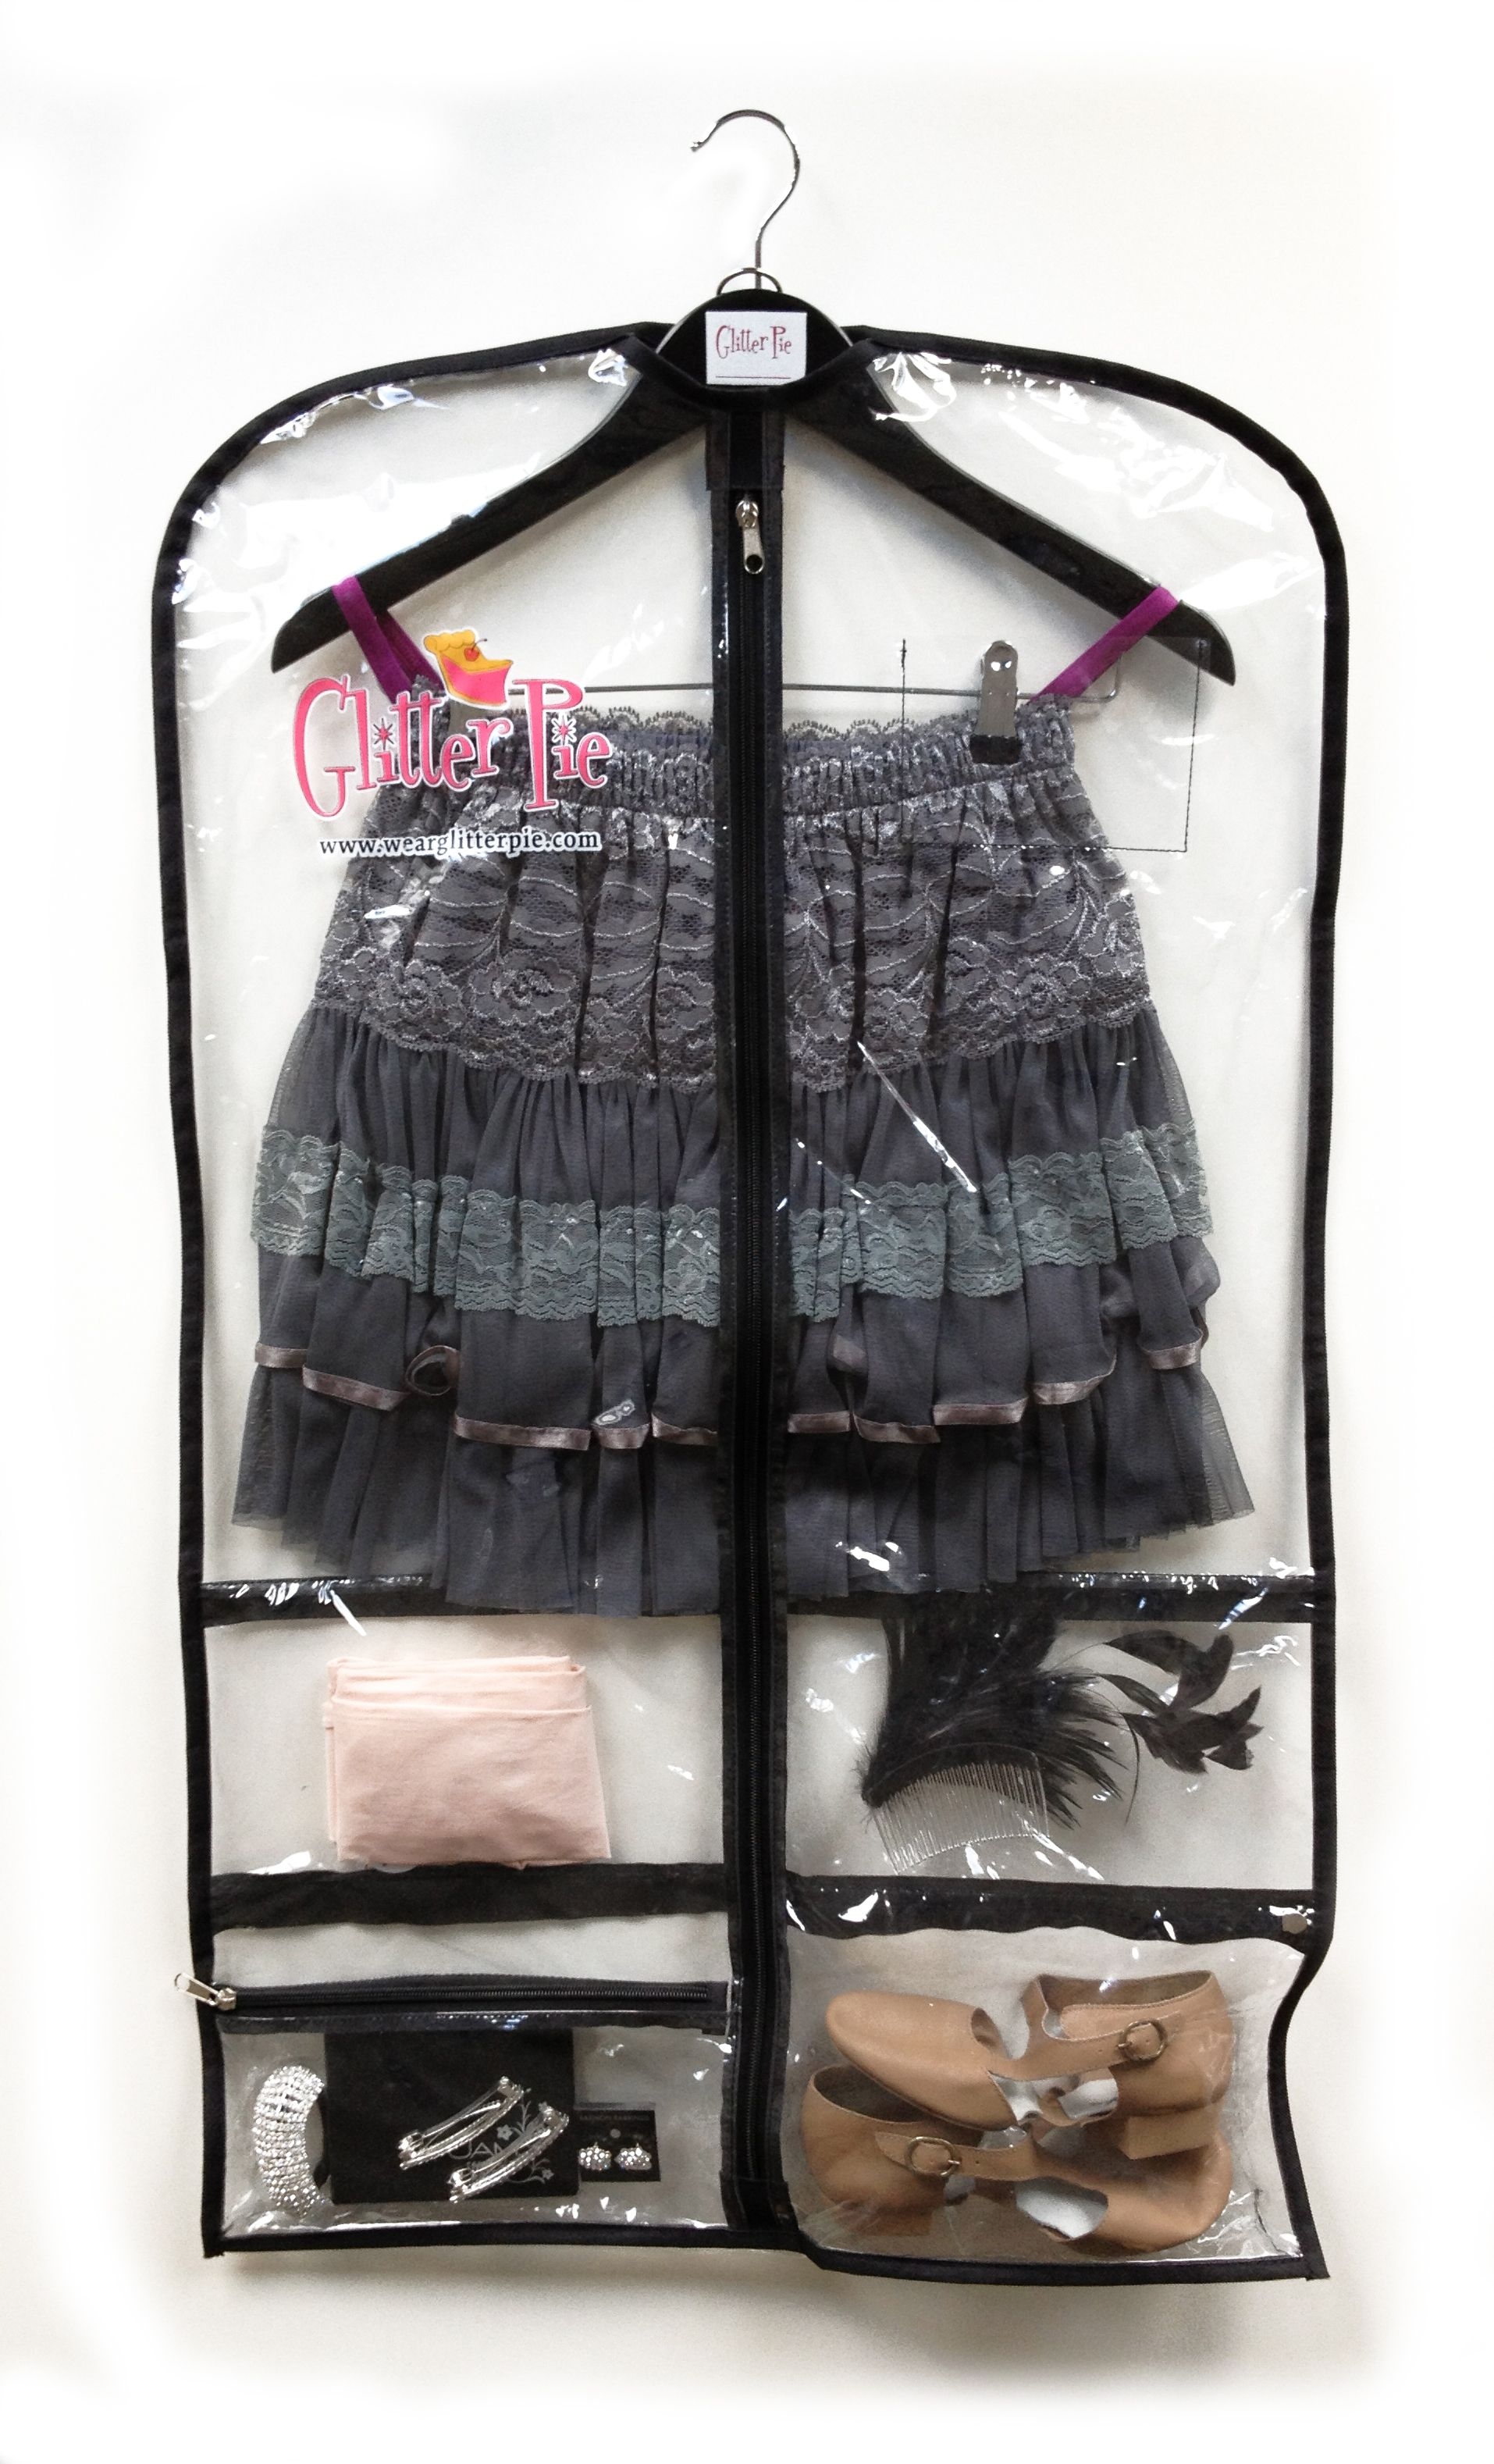 Glitter Pie A5070 Clear Garment Bag